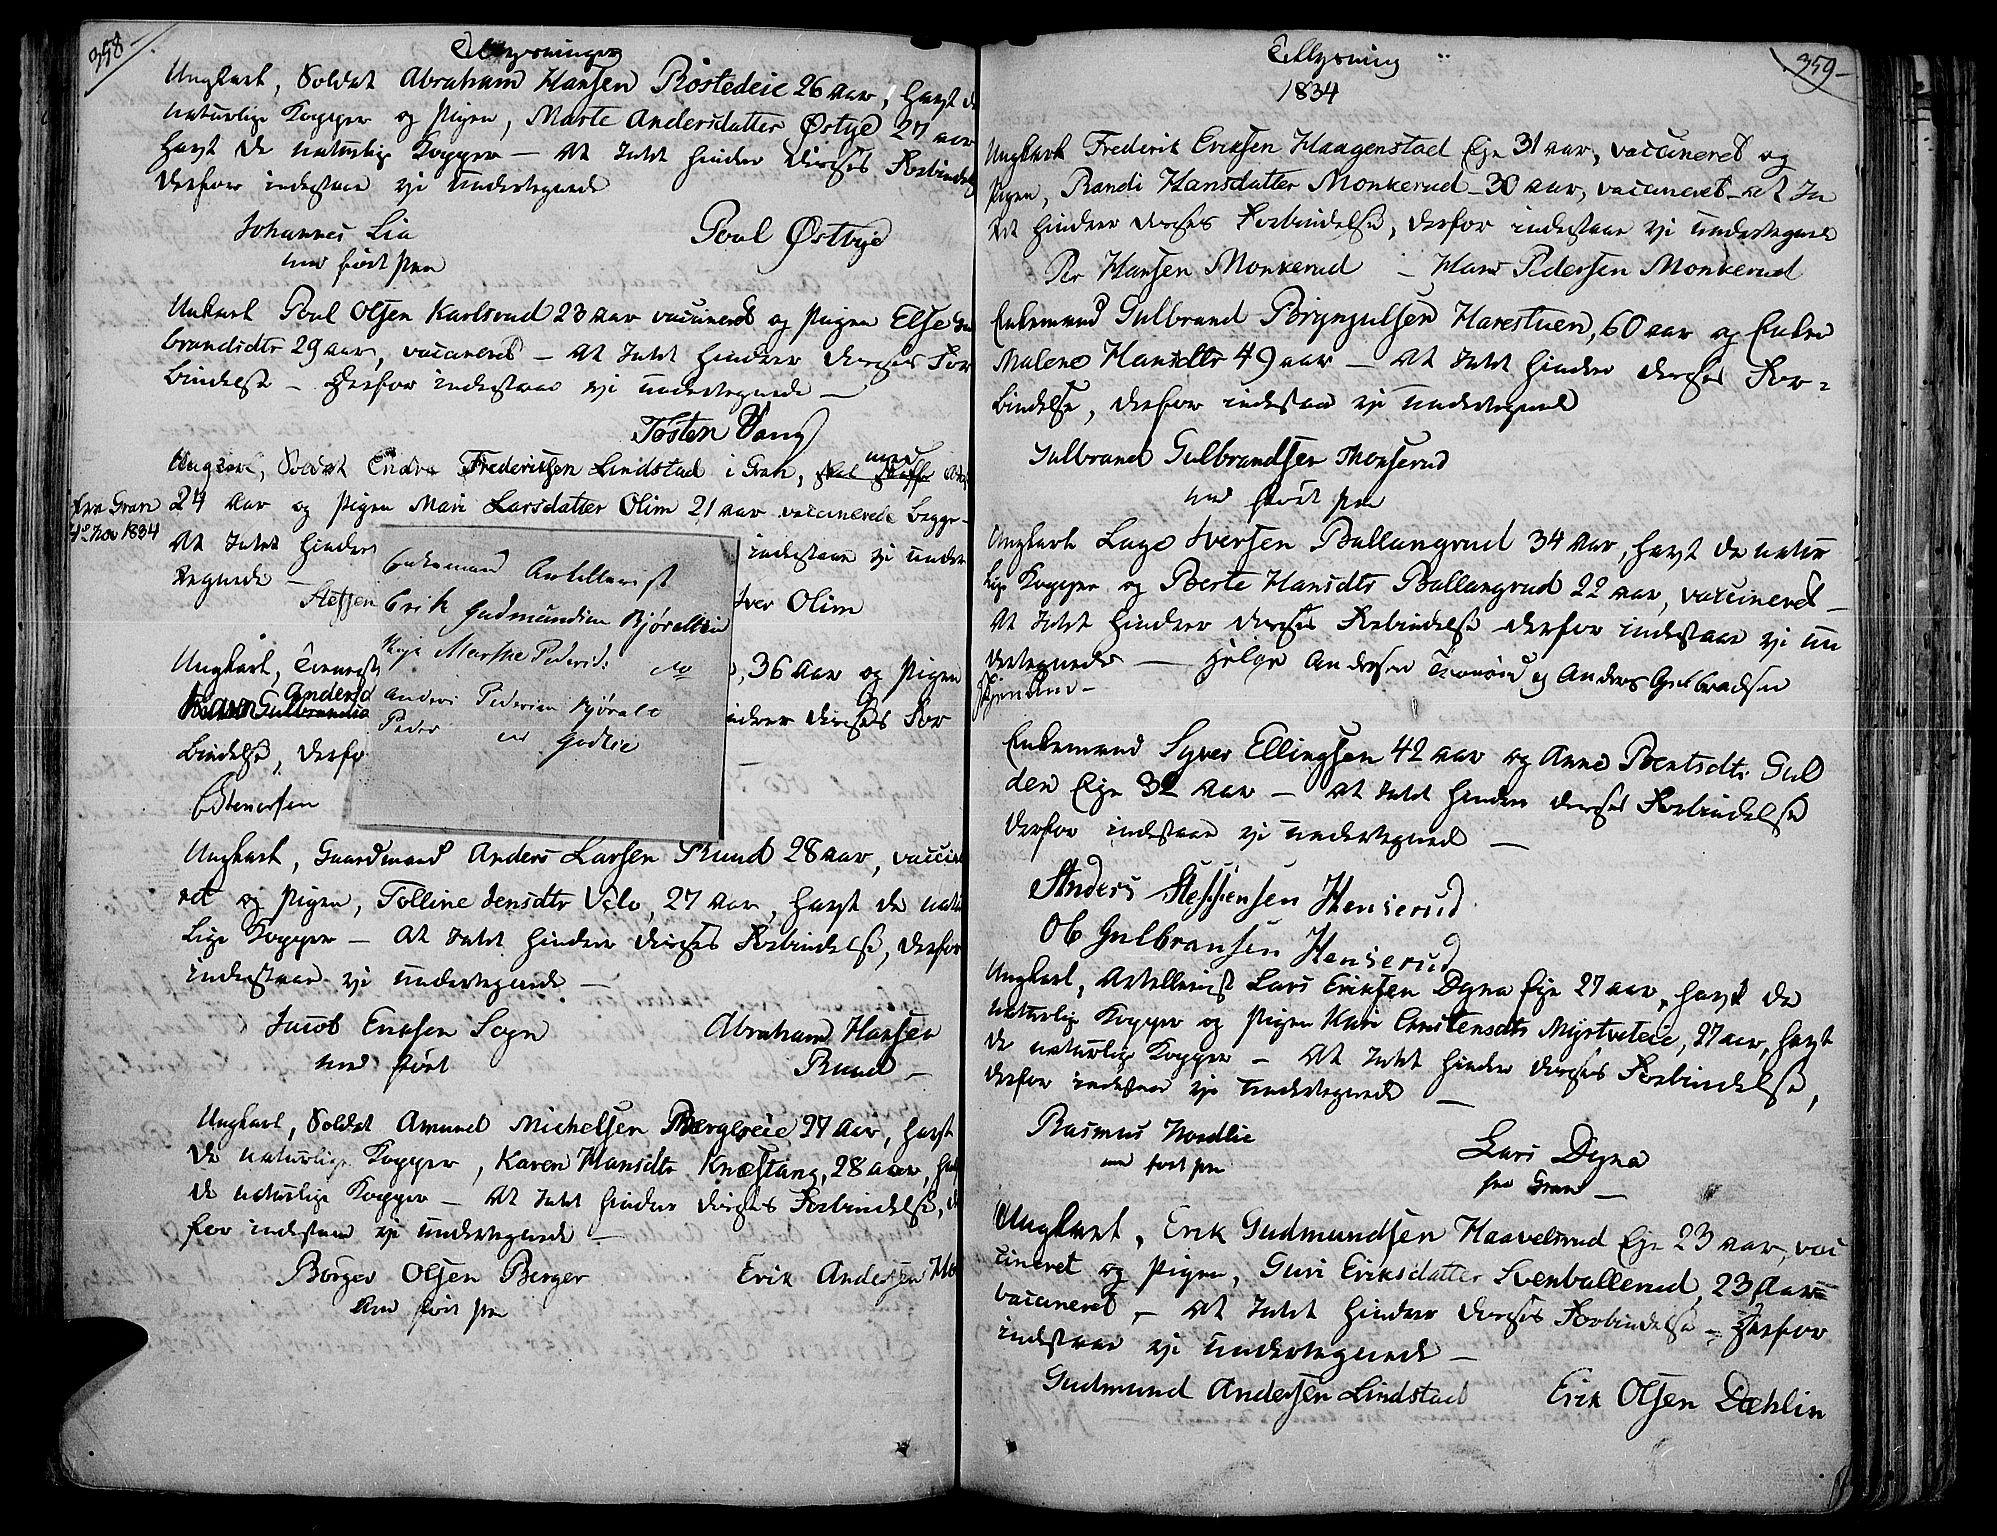 SAH, Jevnaker prestekontor, Ministerialbok nr. 4, 1800-1861, s. 358-359